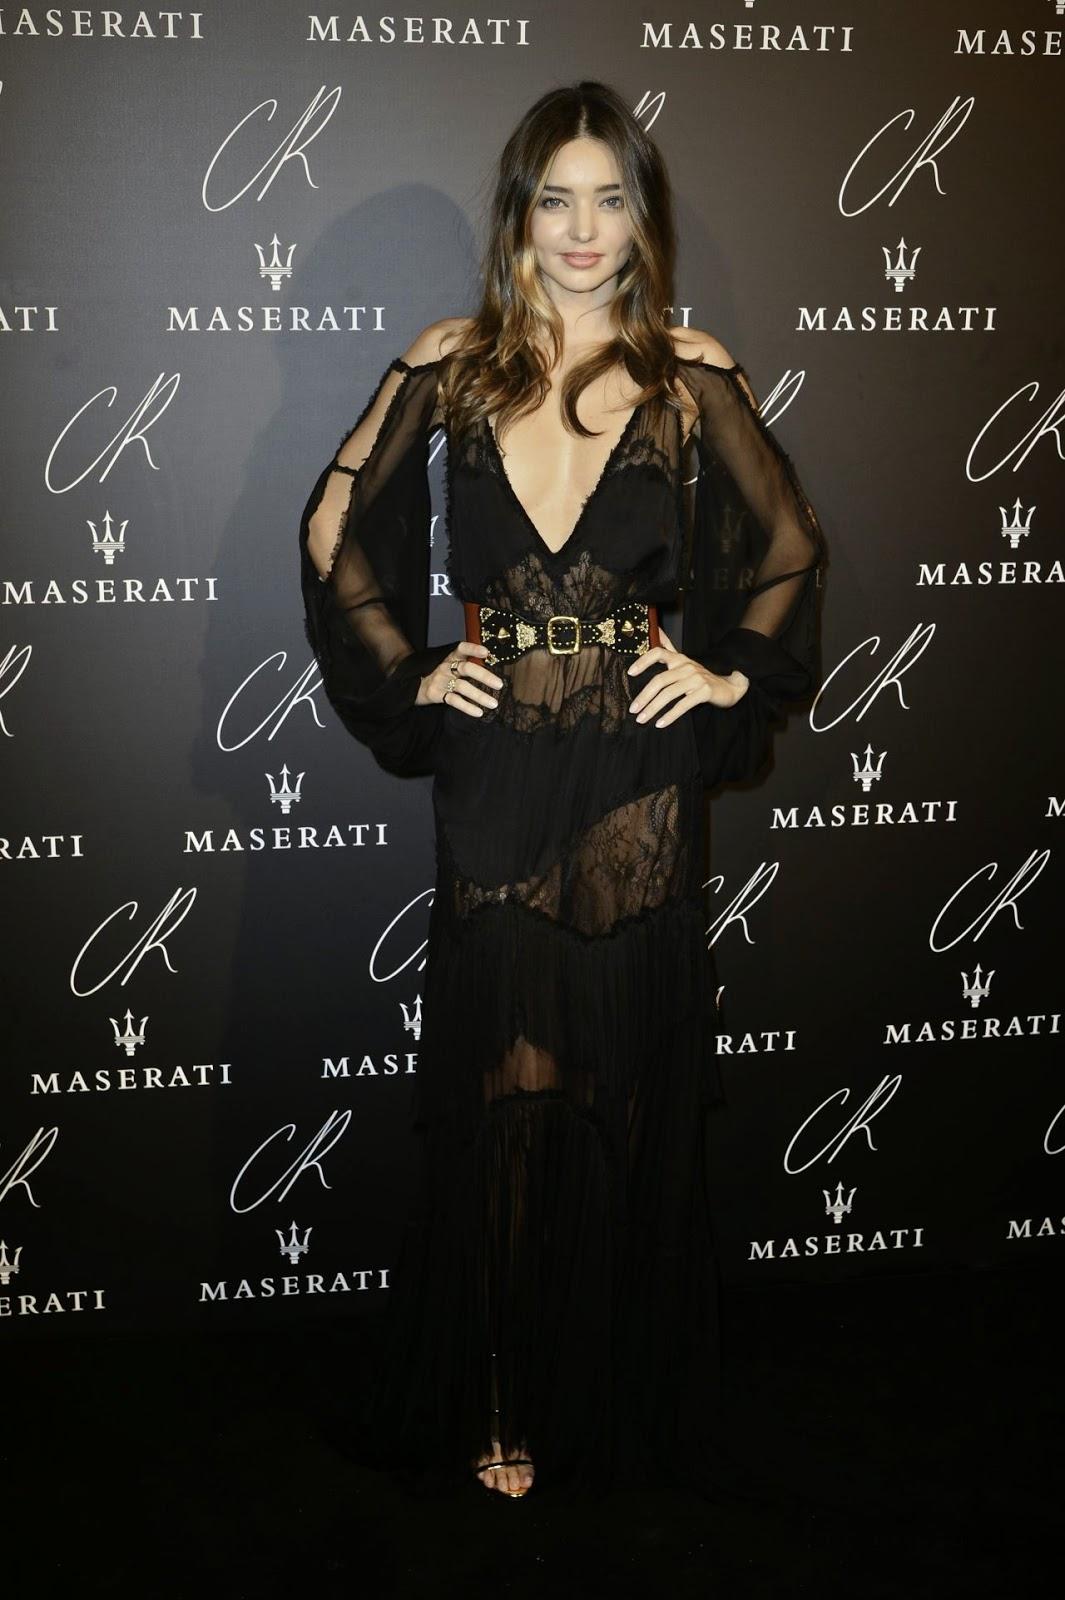 Miranda Kerr stuns in Emilio Pucci at the CR Fashion Book #5 Paris Launch Party